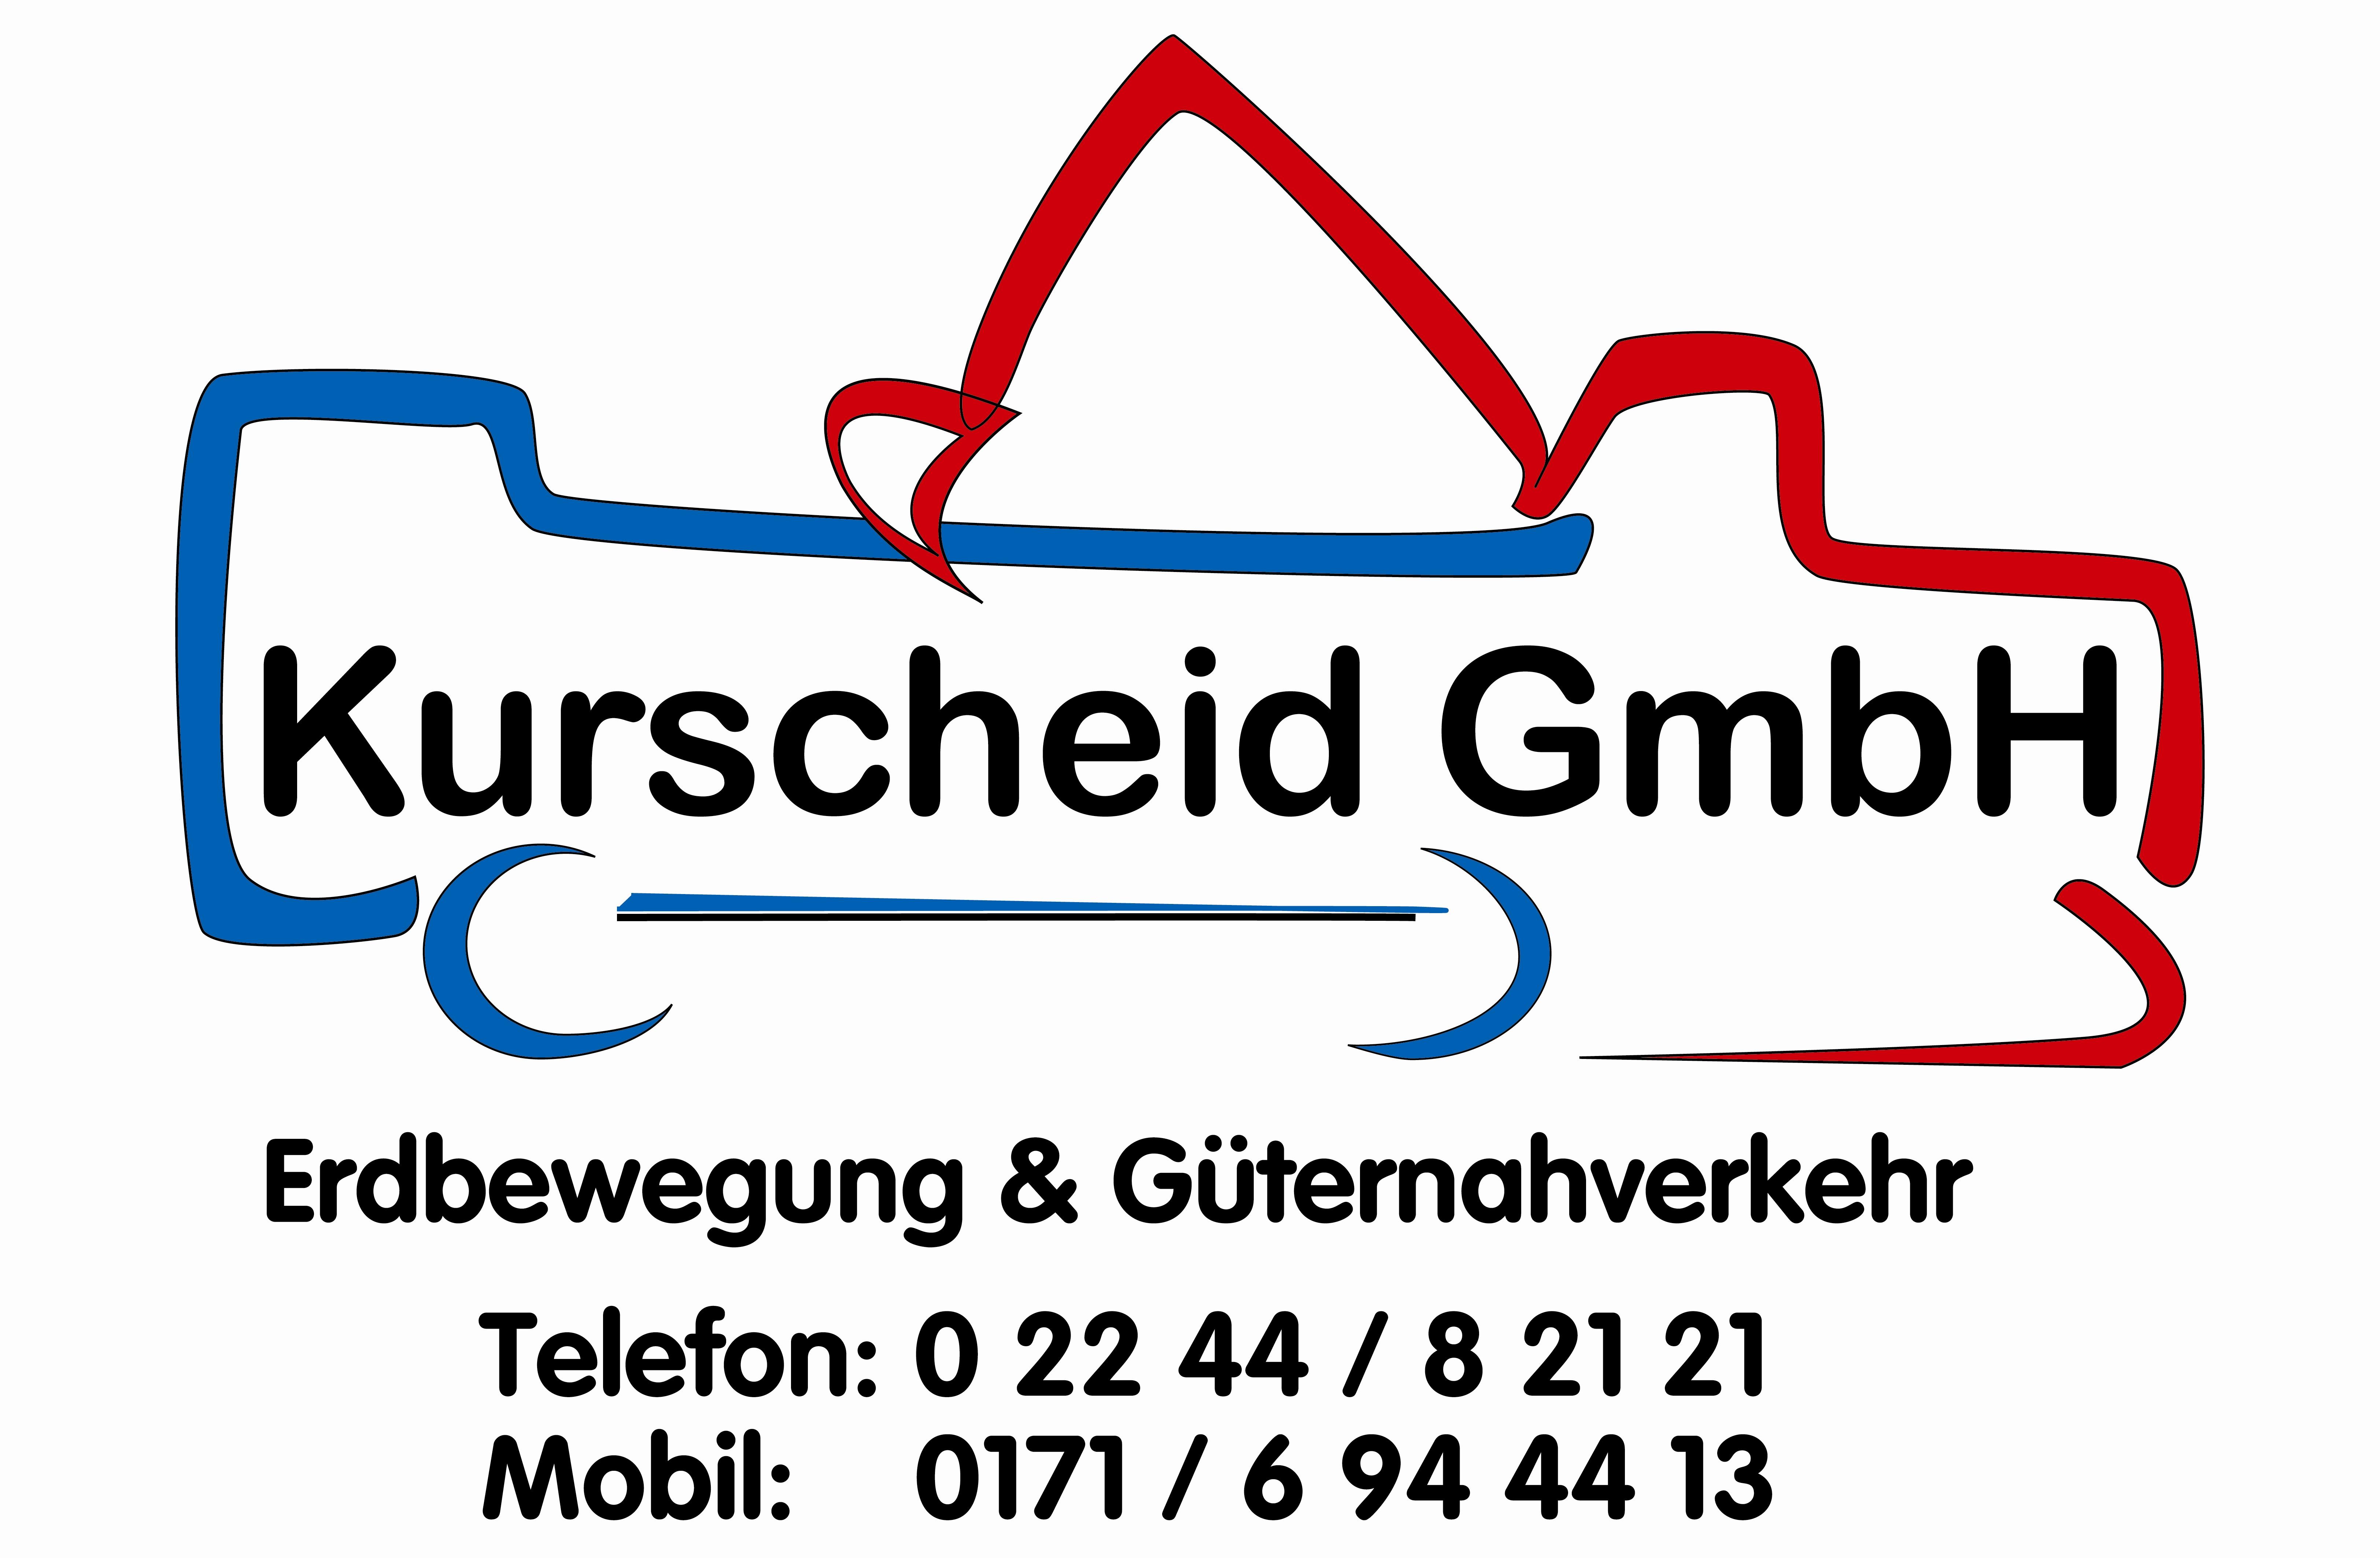 Kurscheid GmbH